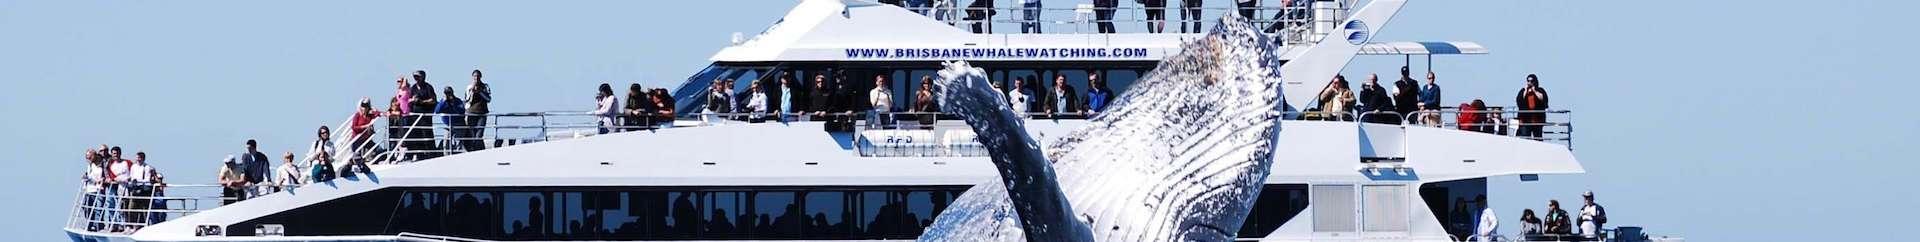 Brisbane Whale Watching tours